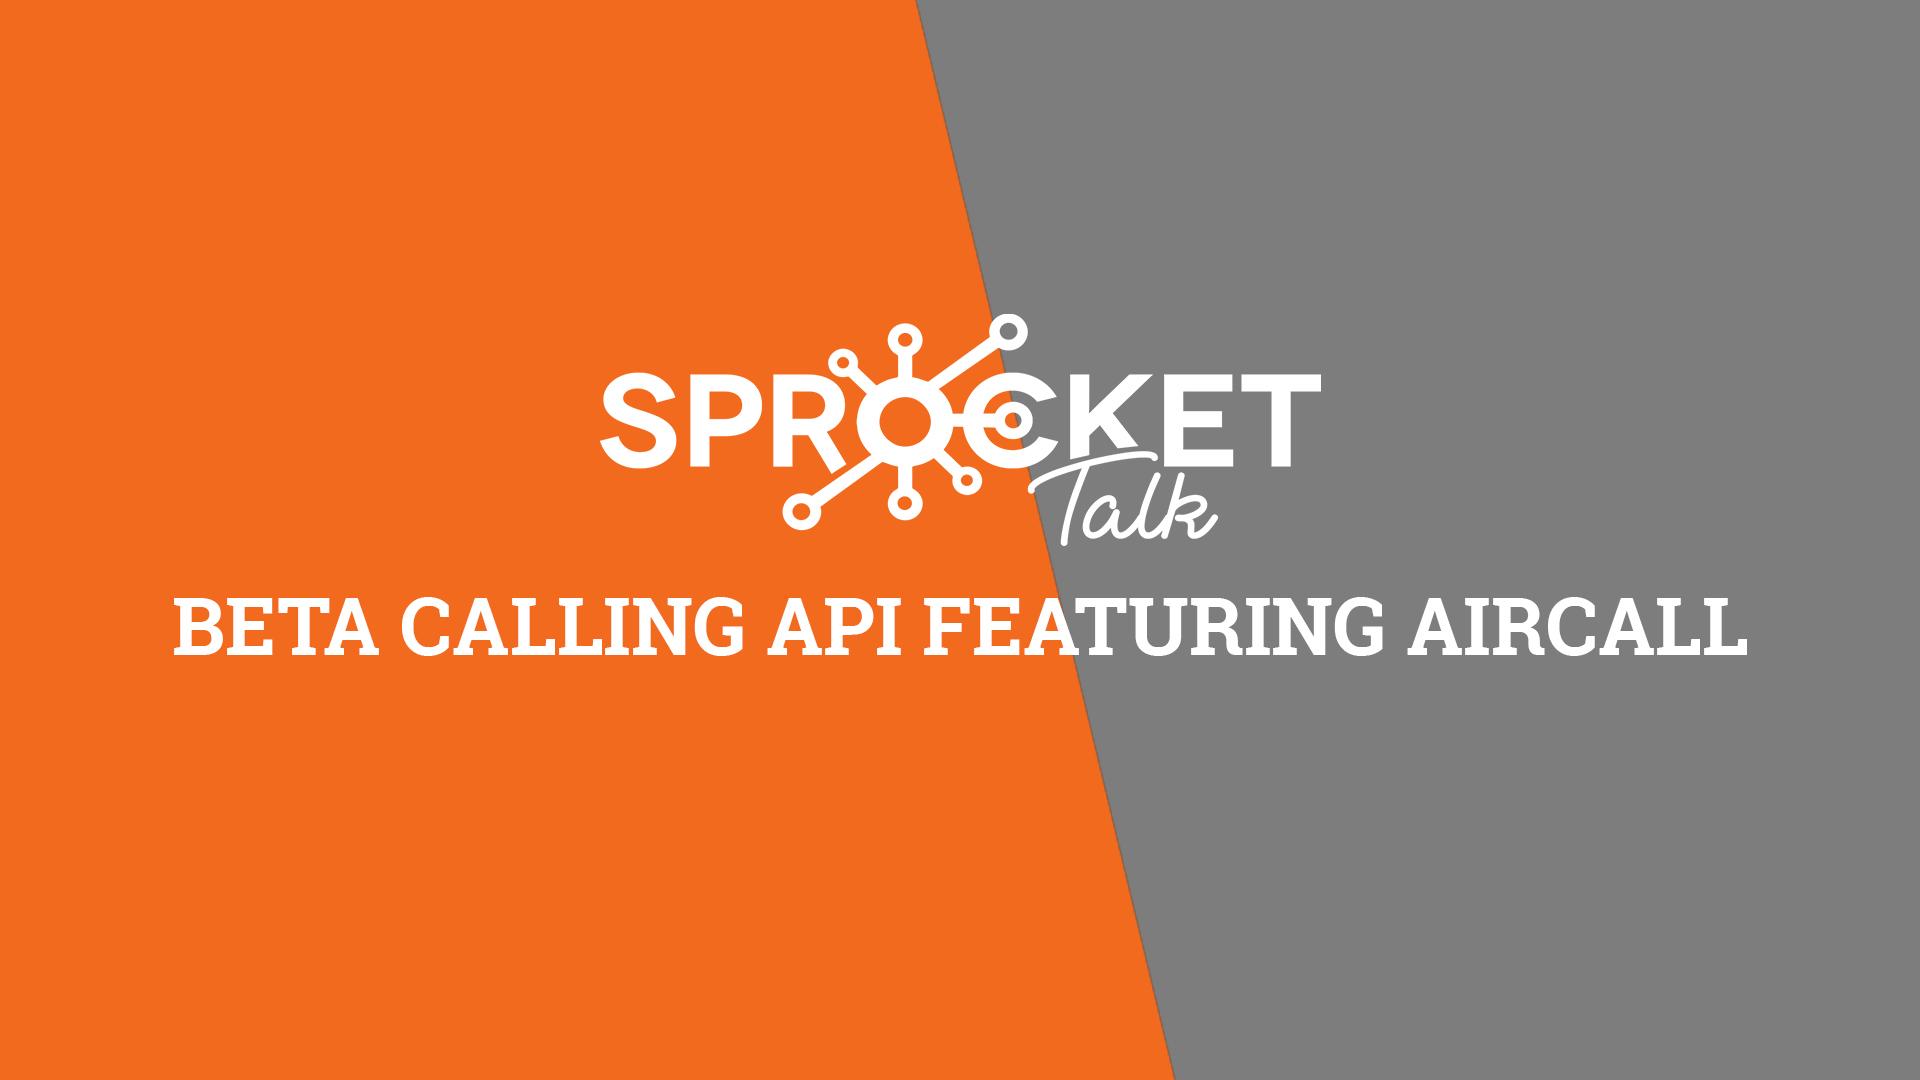 BETA Calling API Featuring Aircall